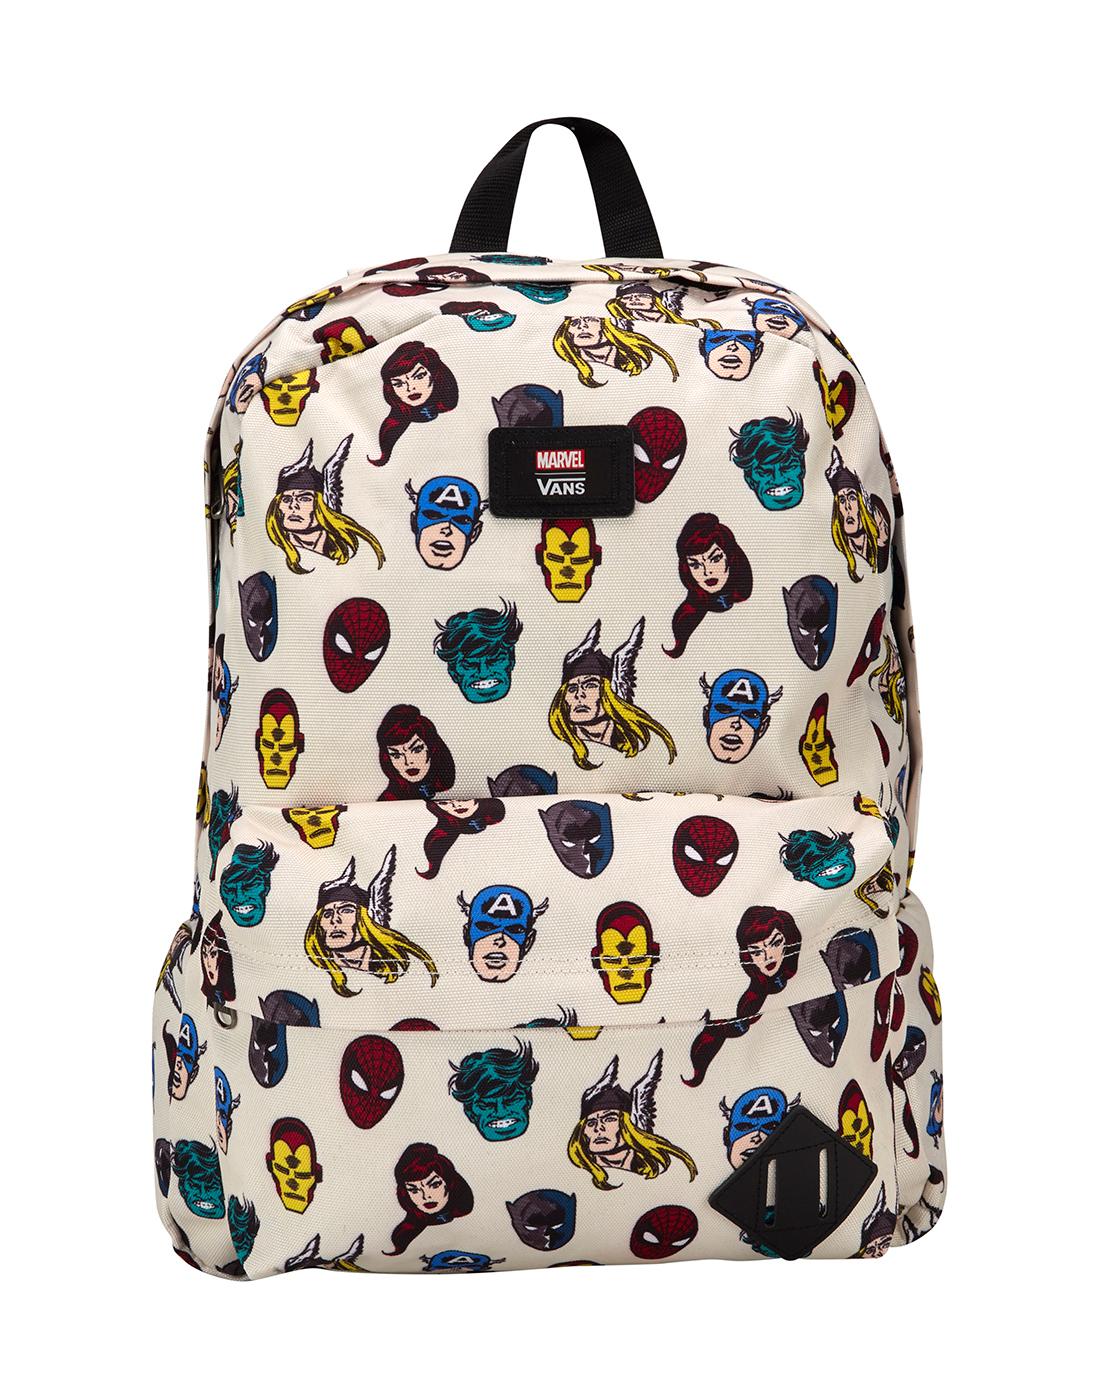 Old Skool II Marvel Backpack